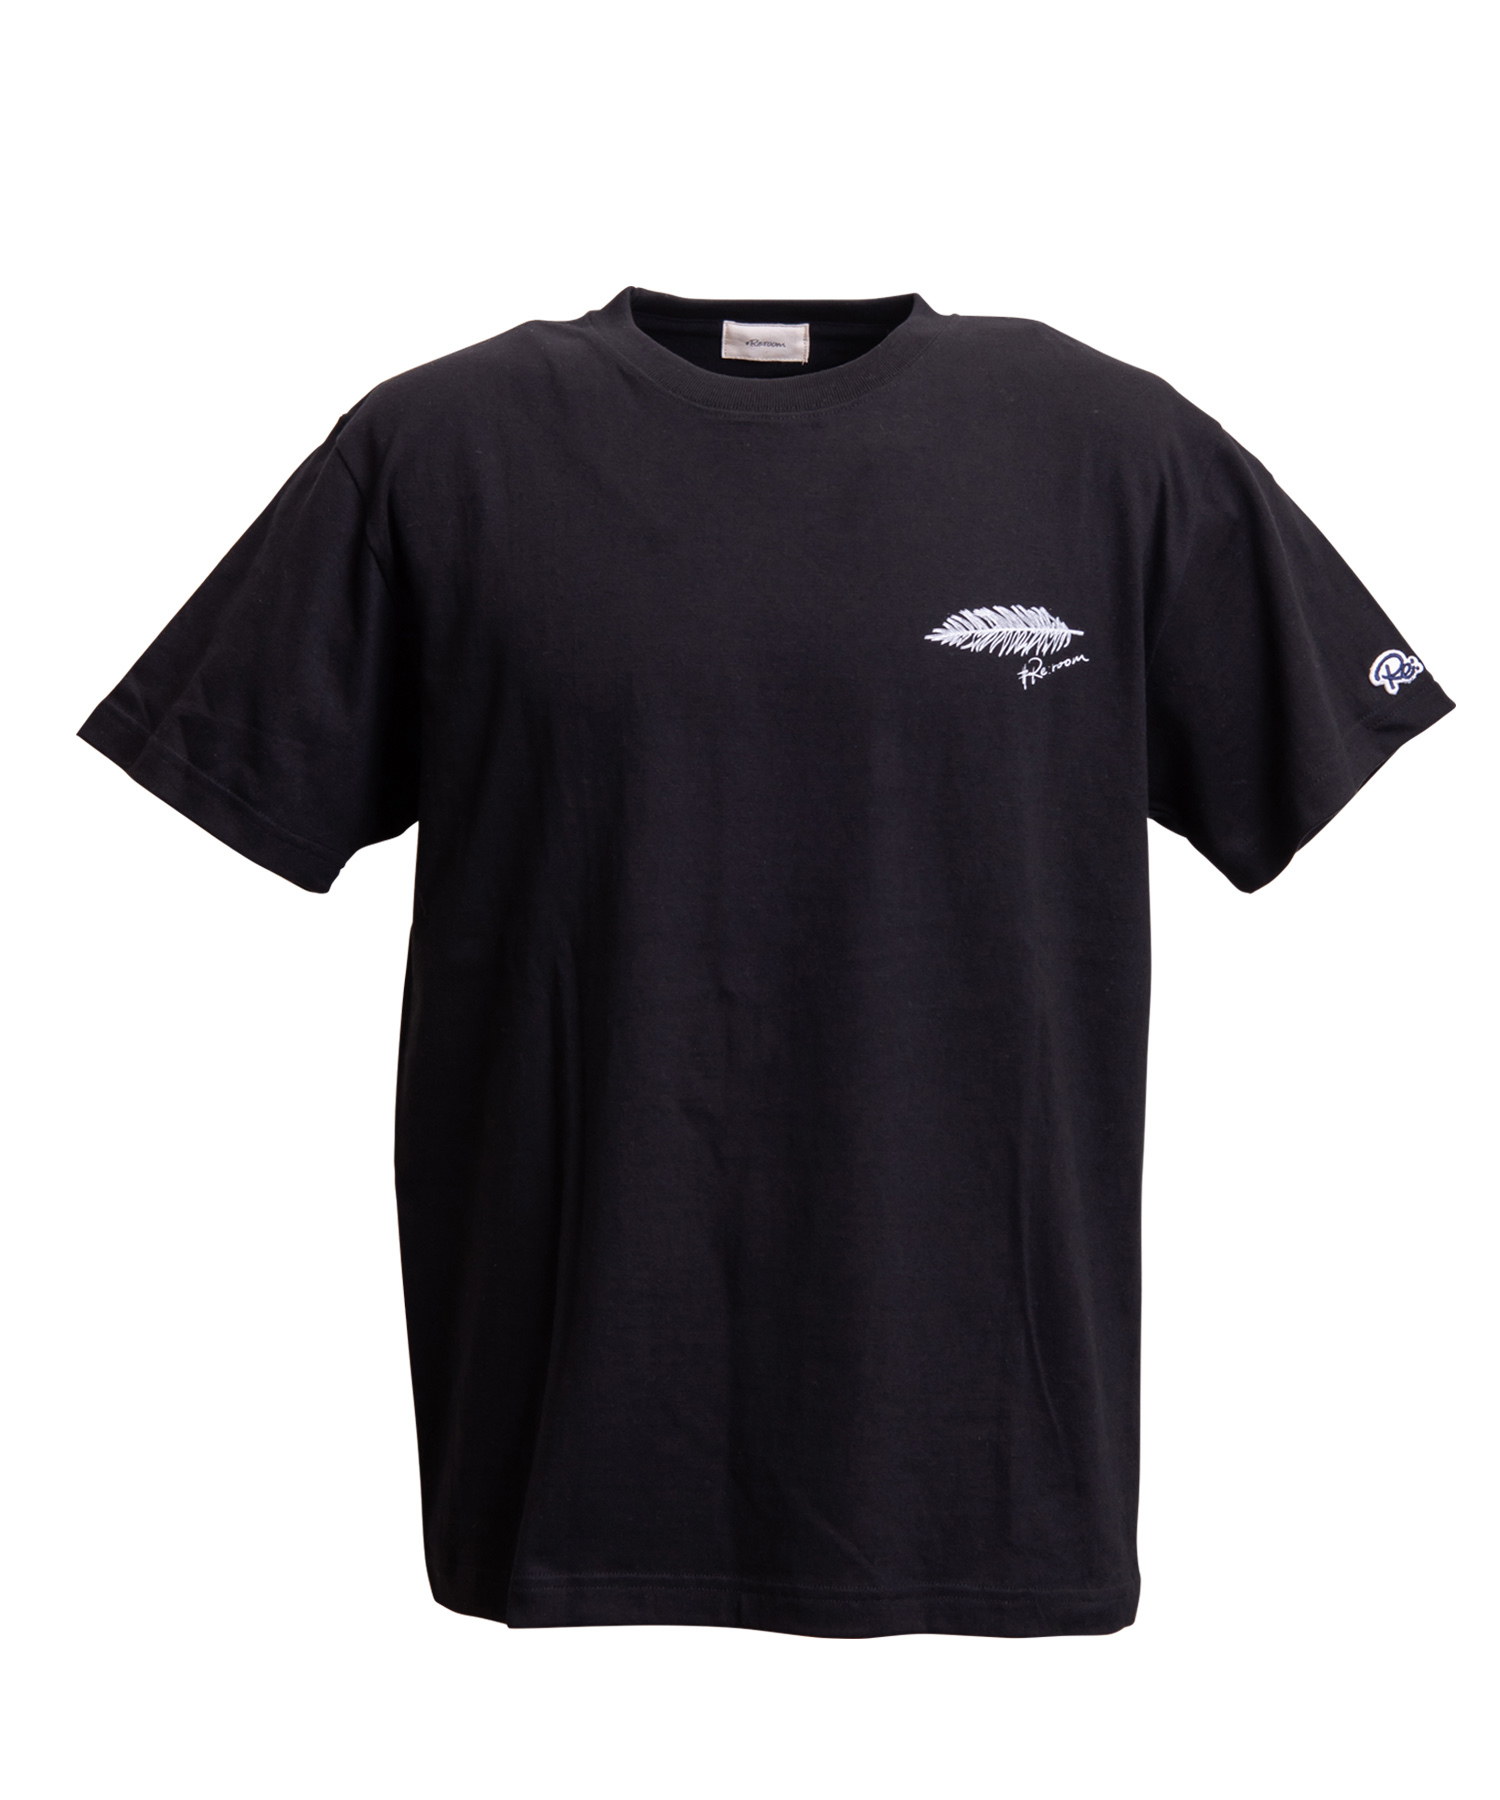 PALM REAF LOGO T-shirt[REC218]